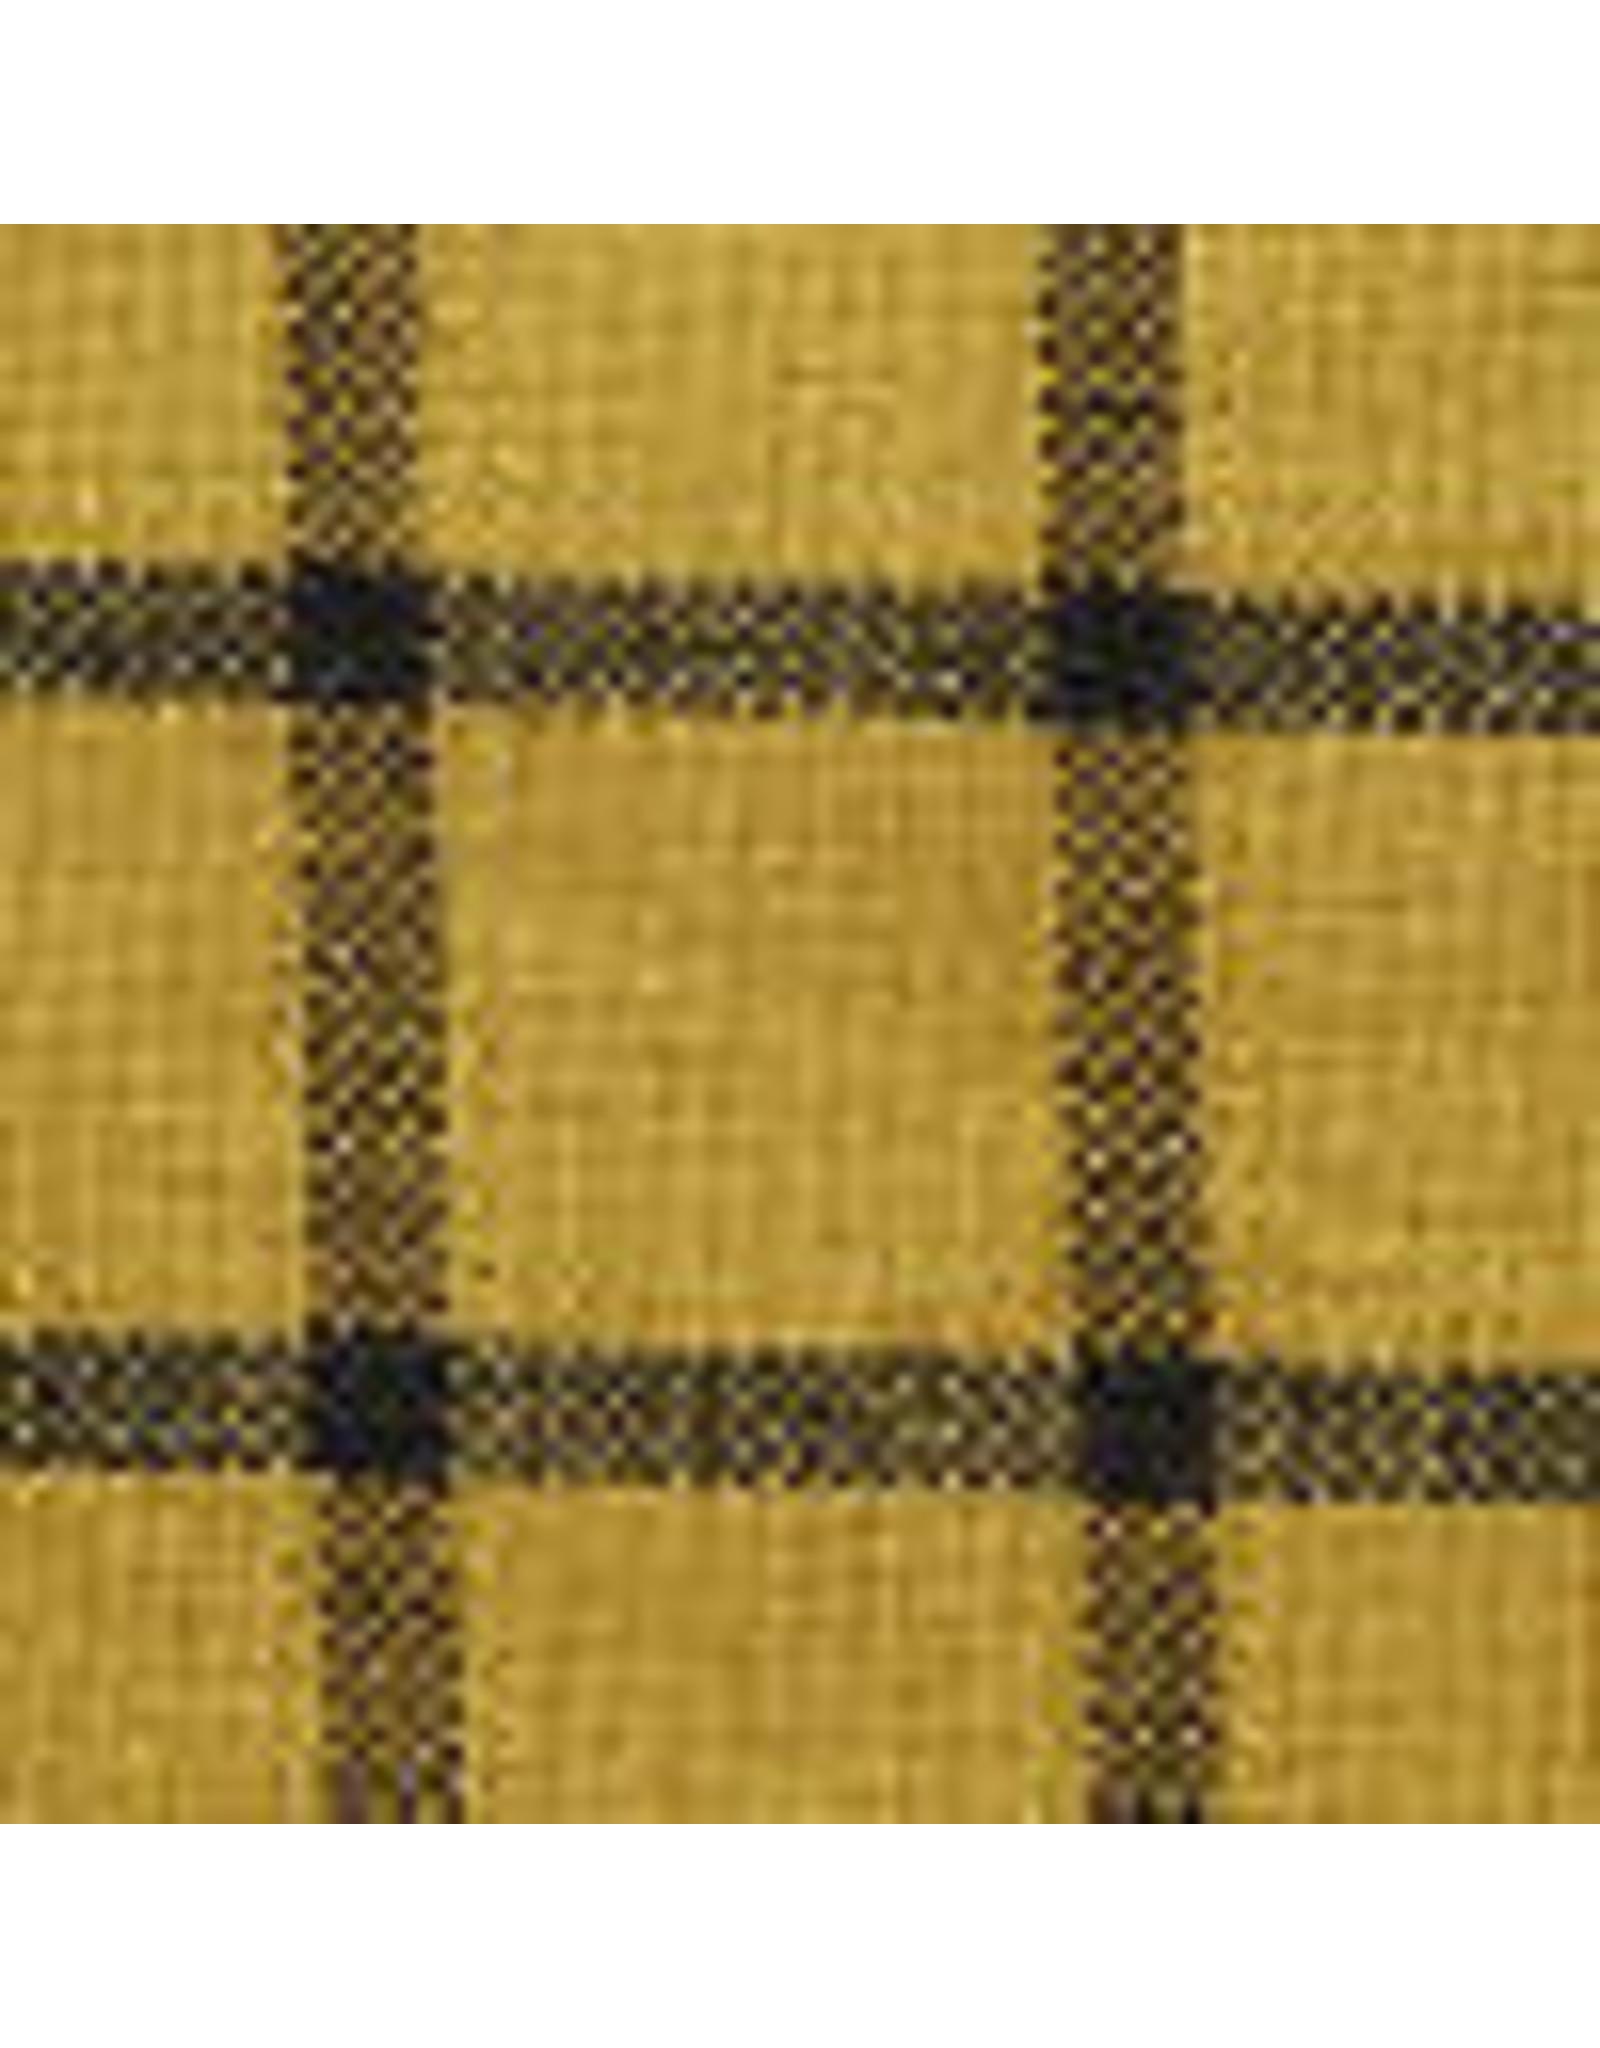 Yd. Mustard and Black Window Pane Fabric #70